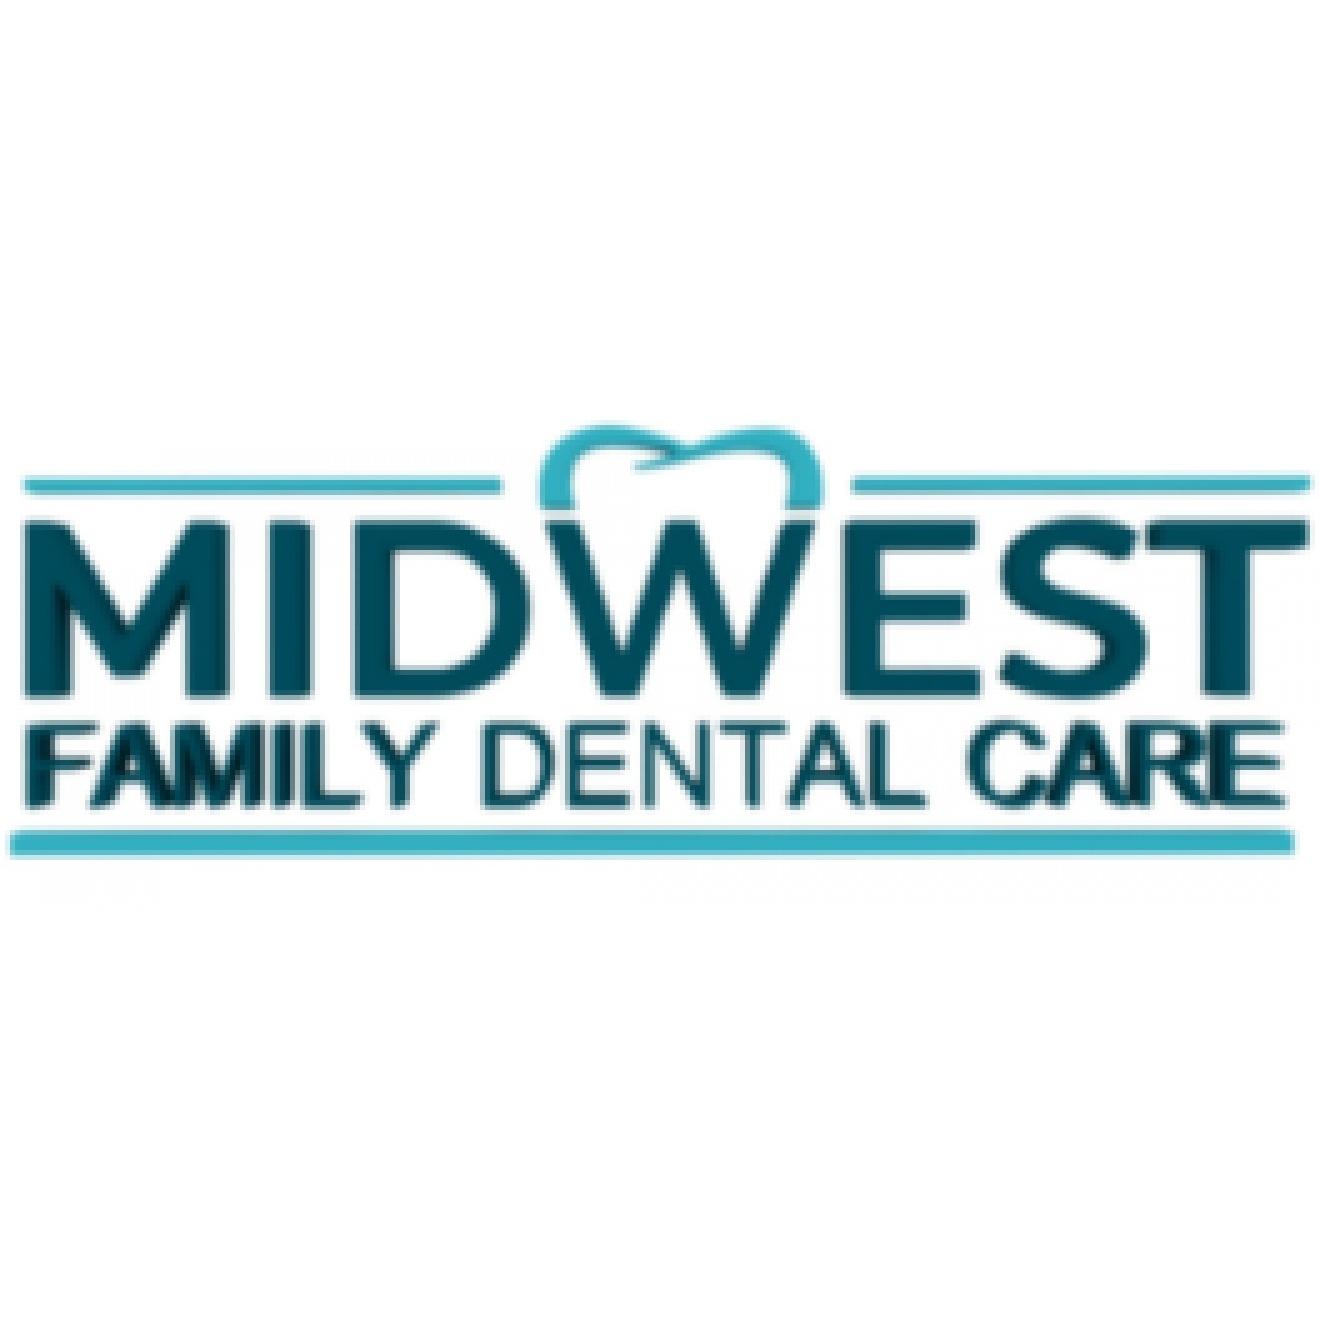 Midwest Family Dental Care - Kalamazoo